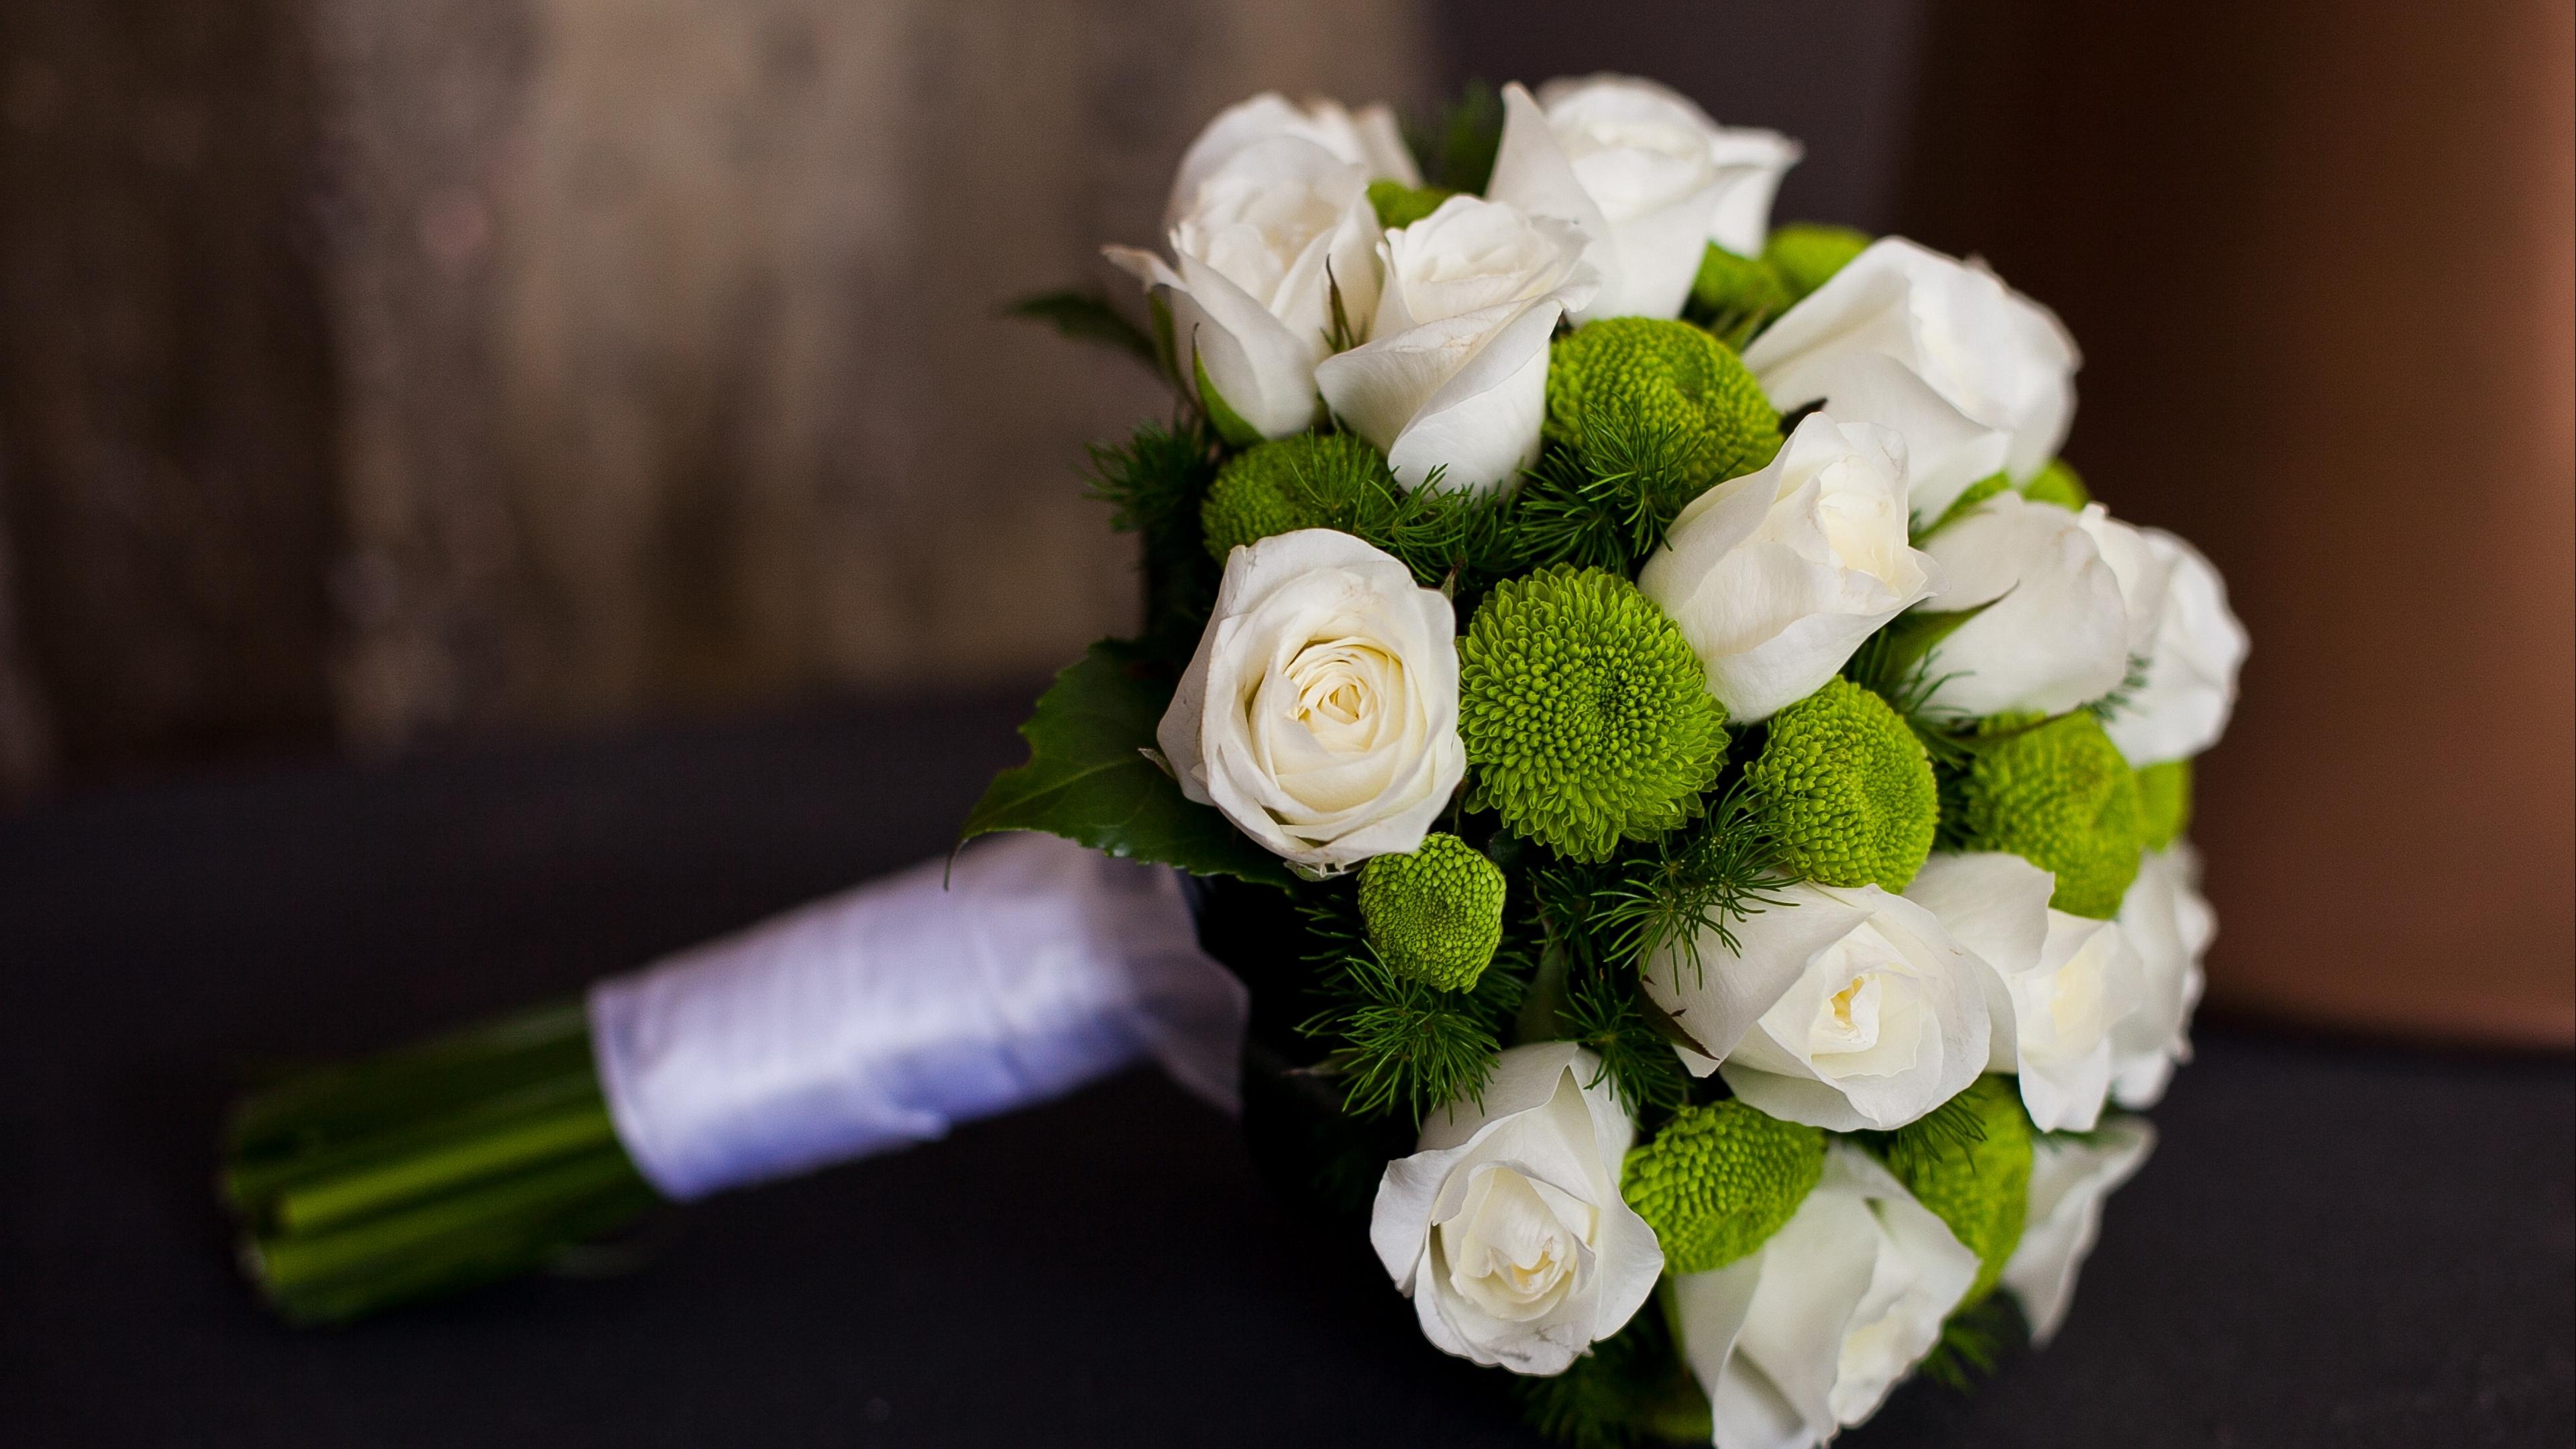 roses flowers bouquet wedding happiness 4k 1540064740 - roses, flowers, bouquet, wedding, happiness 4k - Roses, Flowers, Bouquet